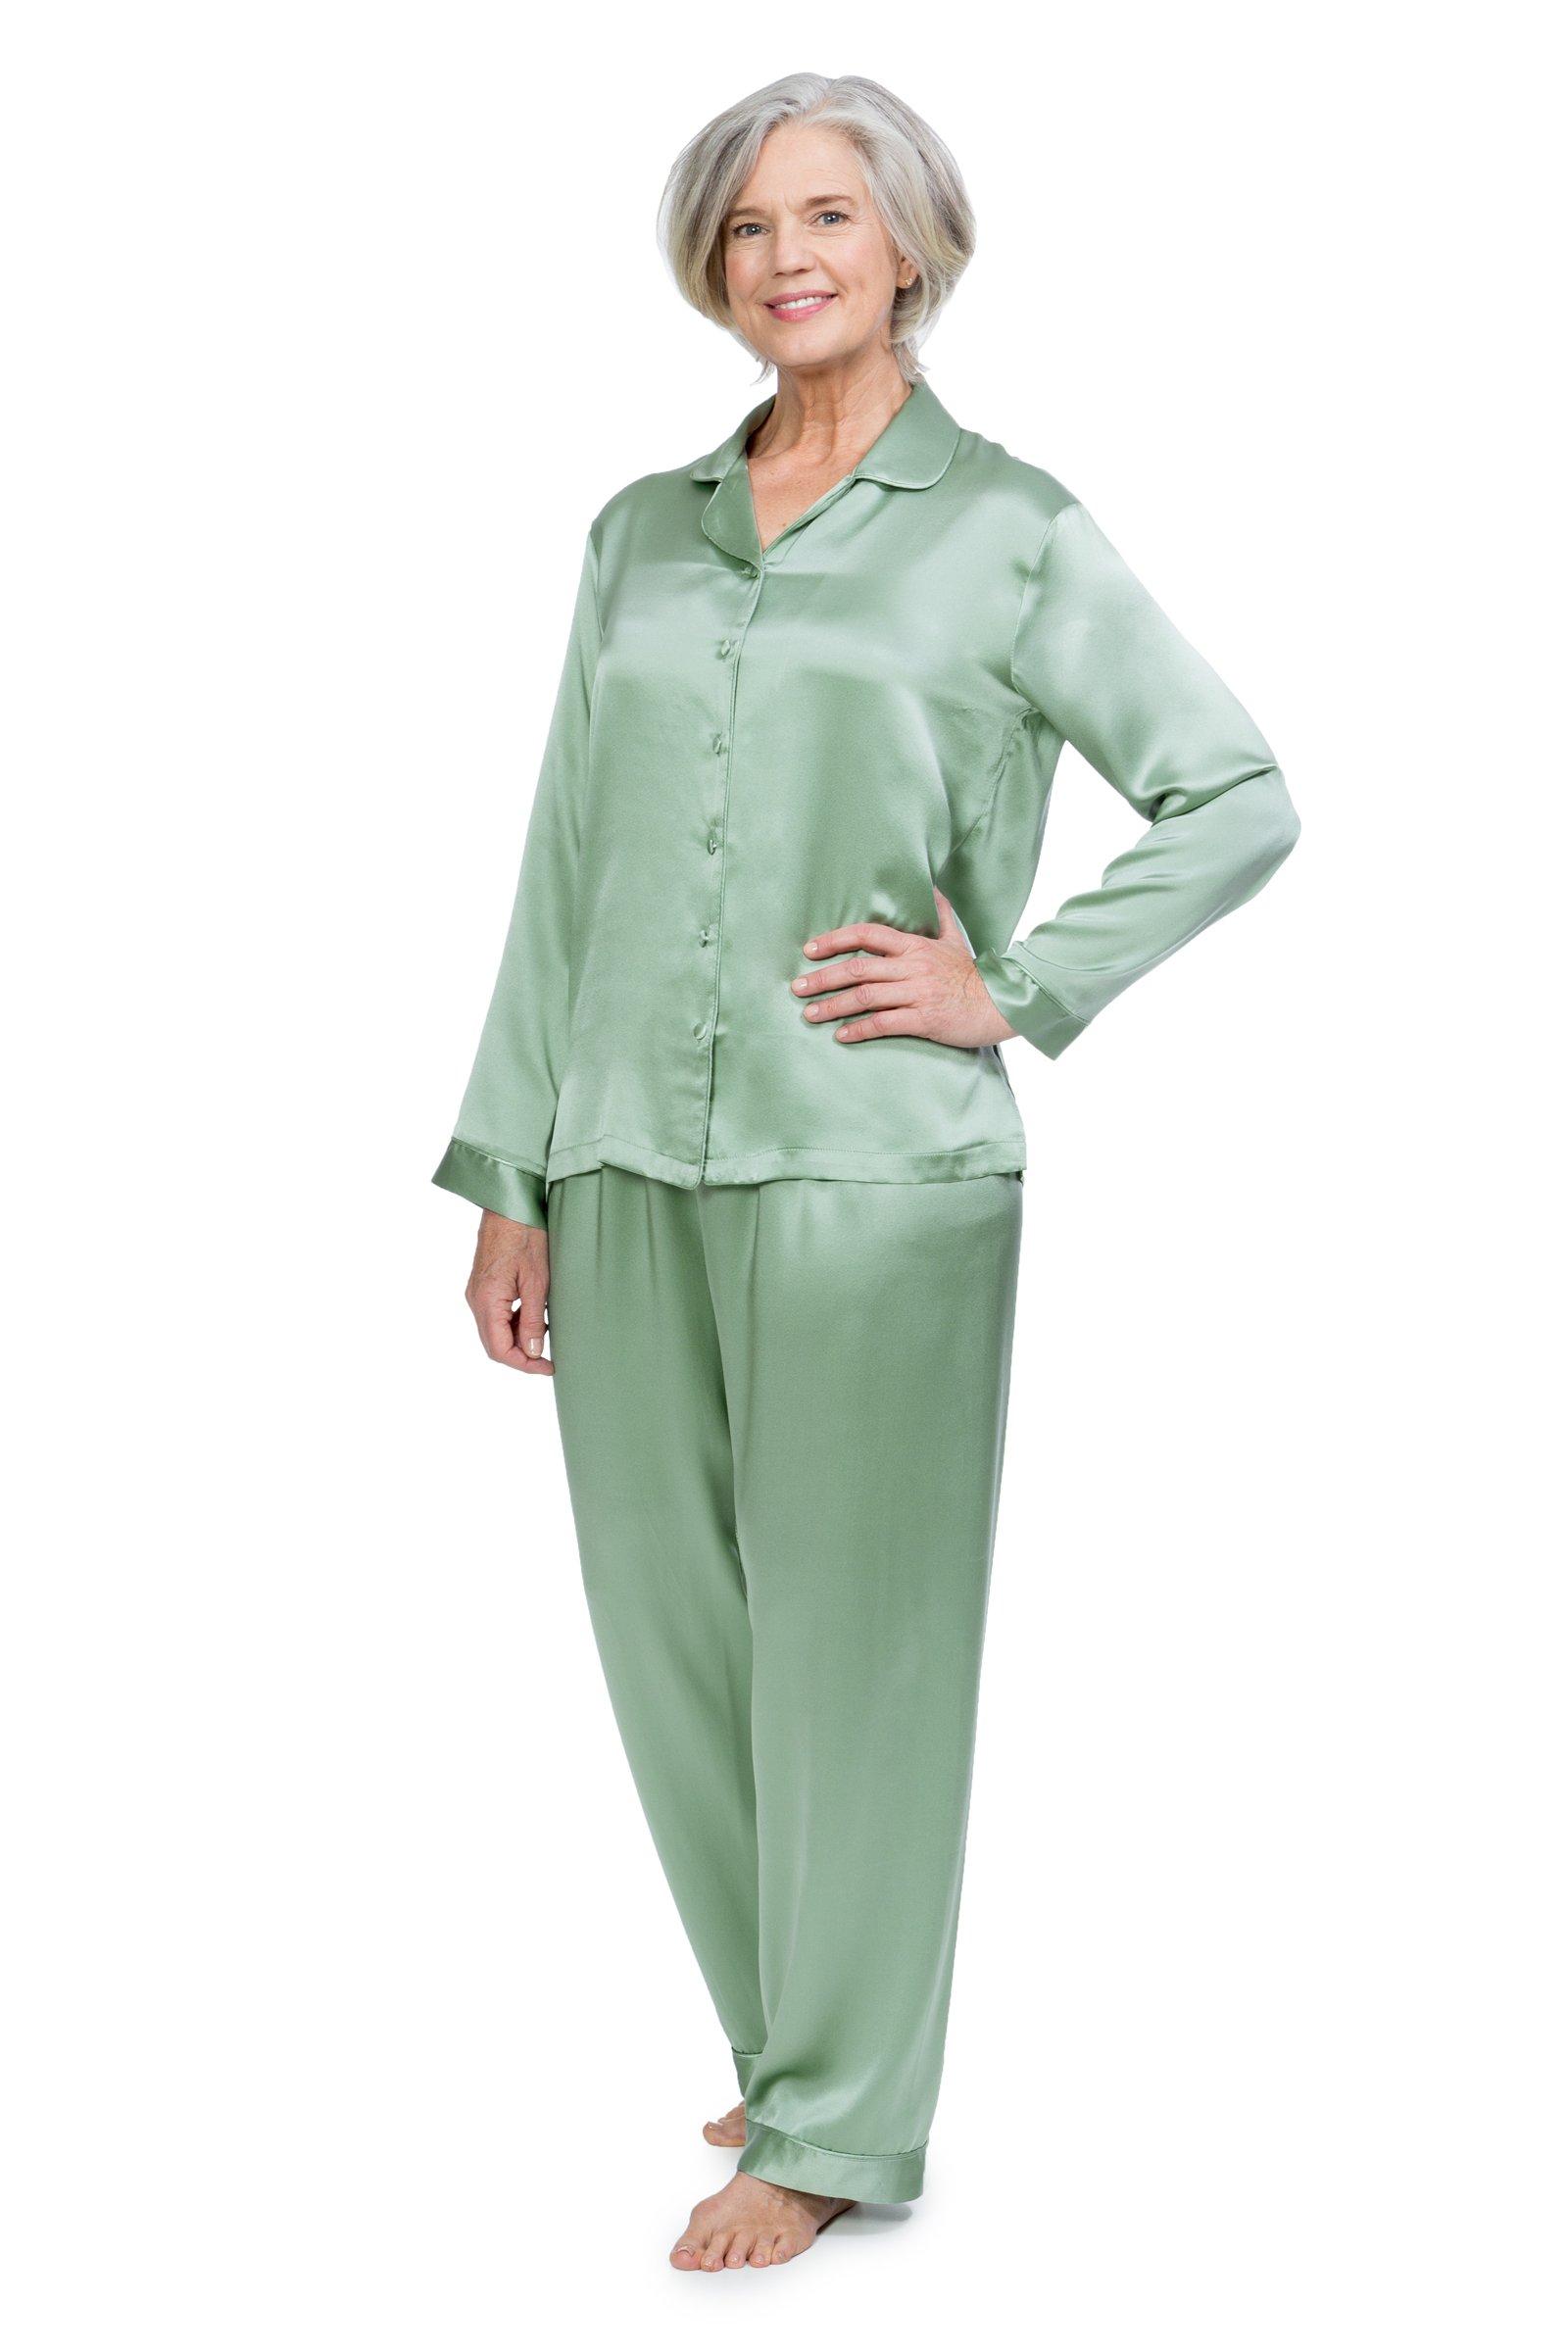 TexereSilk Women's 100% Silk Pajama Set - Luxury Sleepwear PJS by (Morning Dew, Lily Green, 2X/Petite) Elegant Sleep Wear For Her WS0001-LGN-2XP